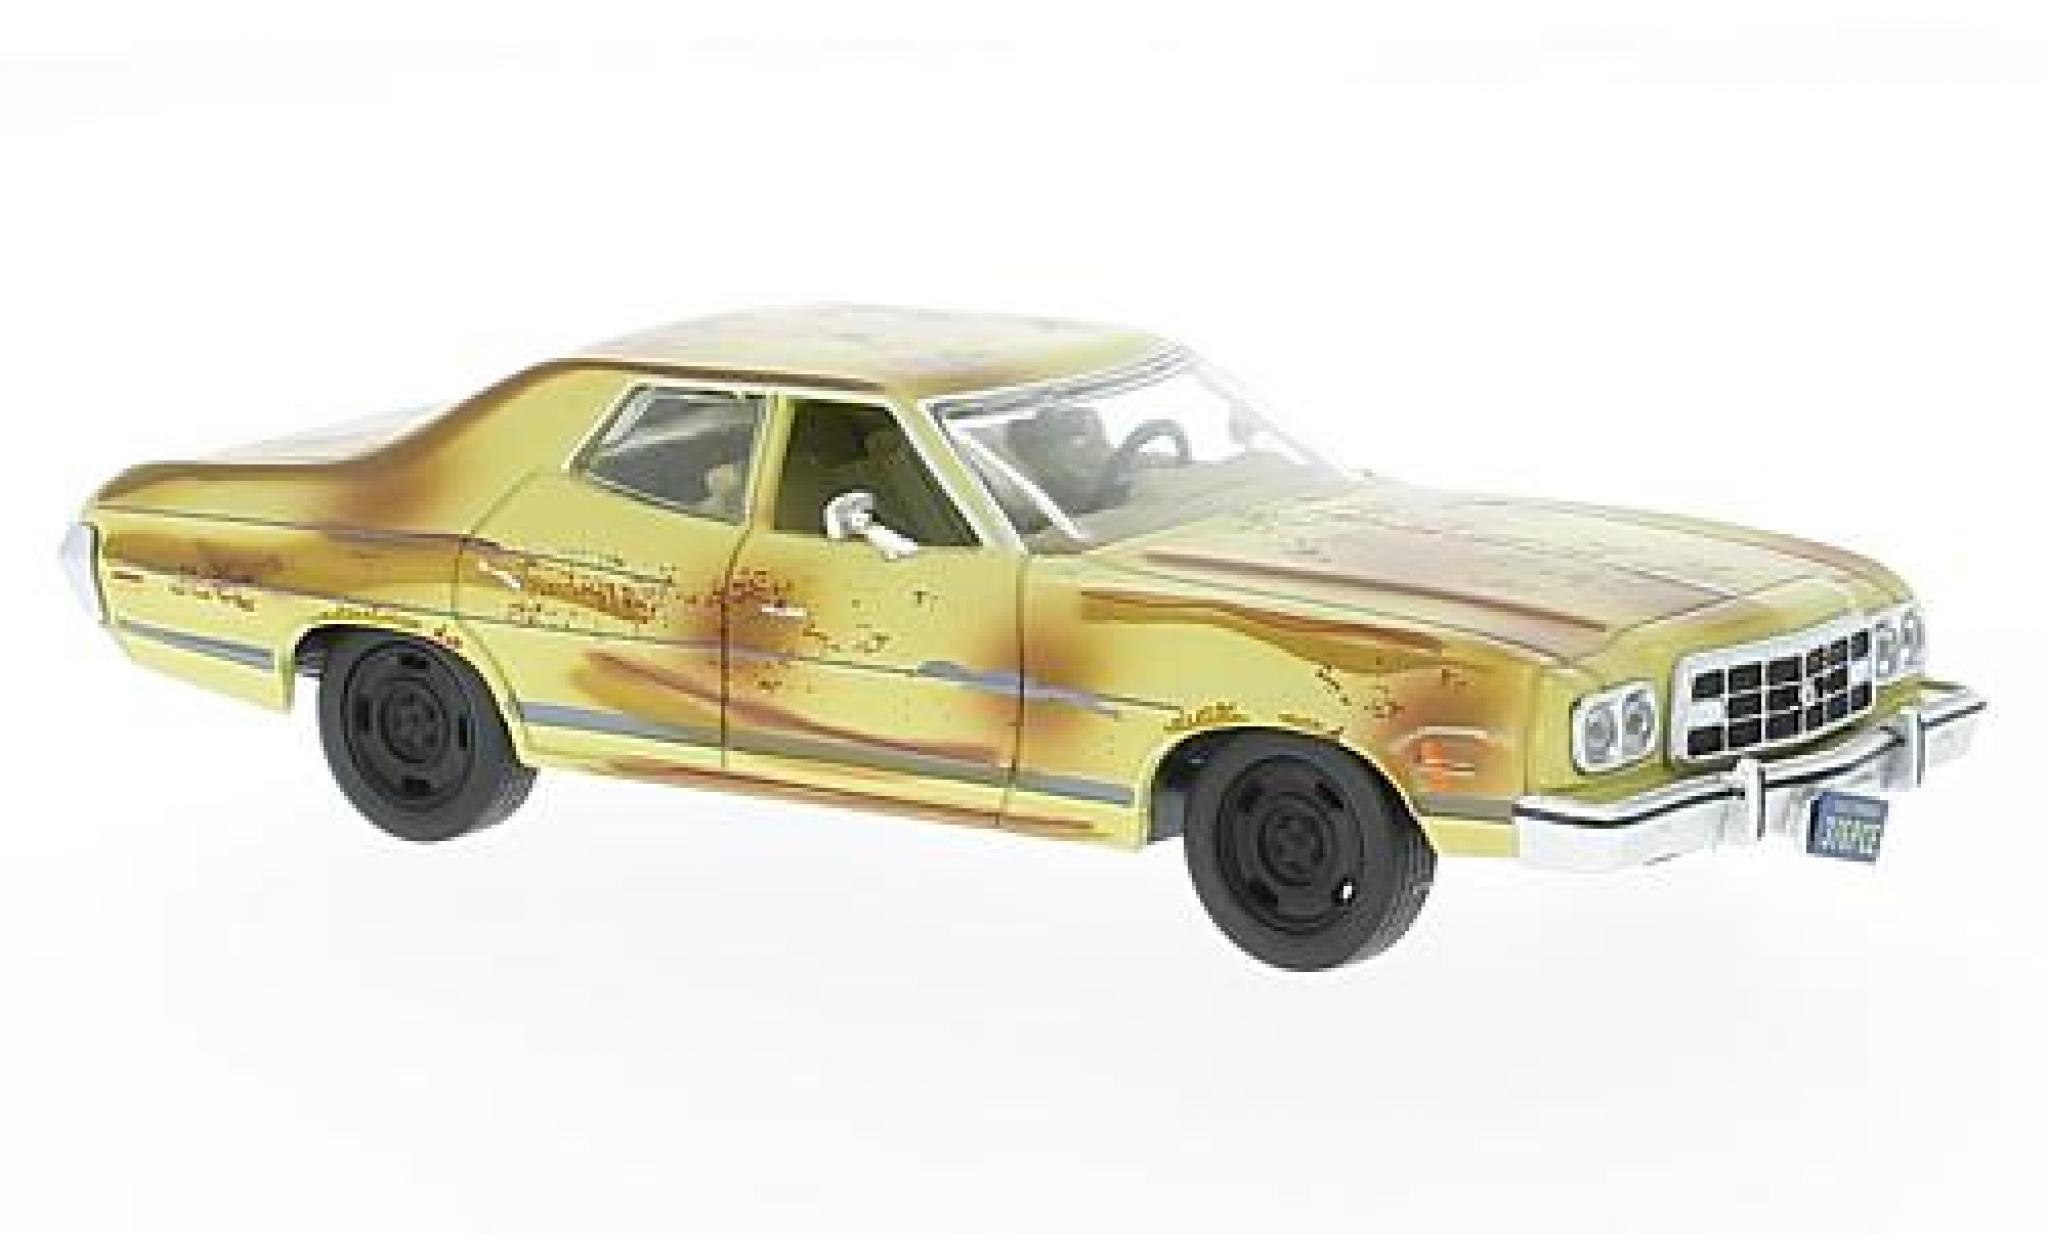 Ford Gran Torino 1/43 Greenlight The Big Lebowski The Dudes 1973